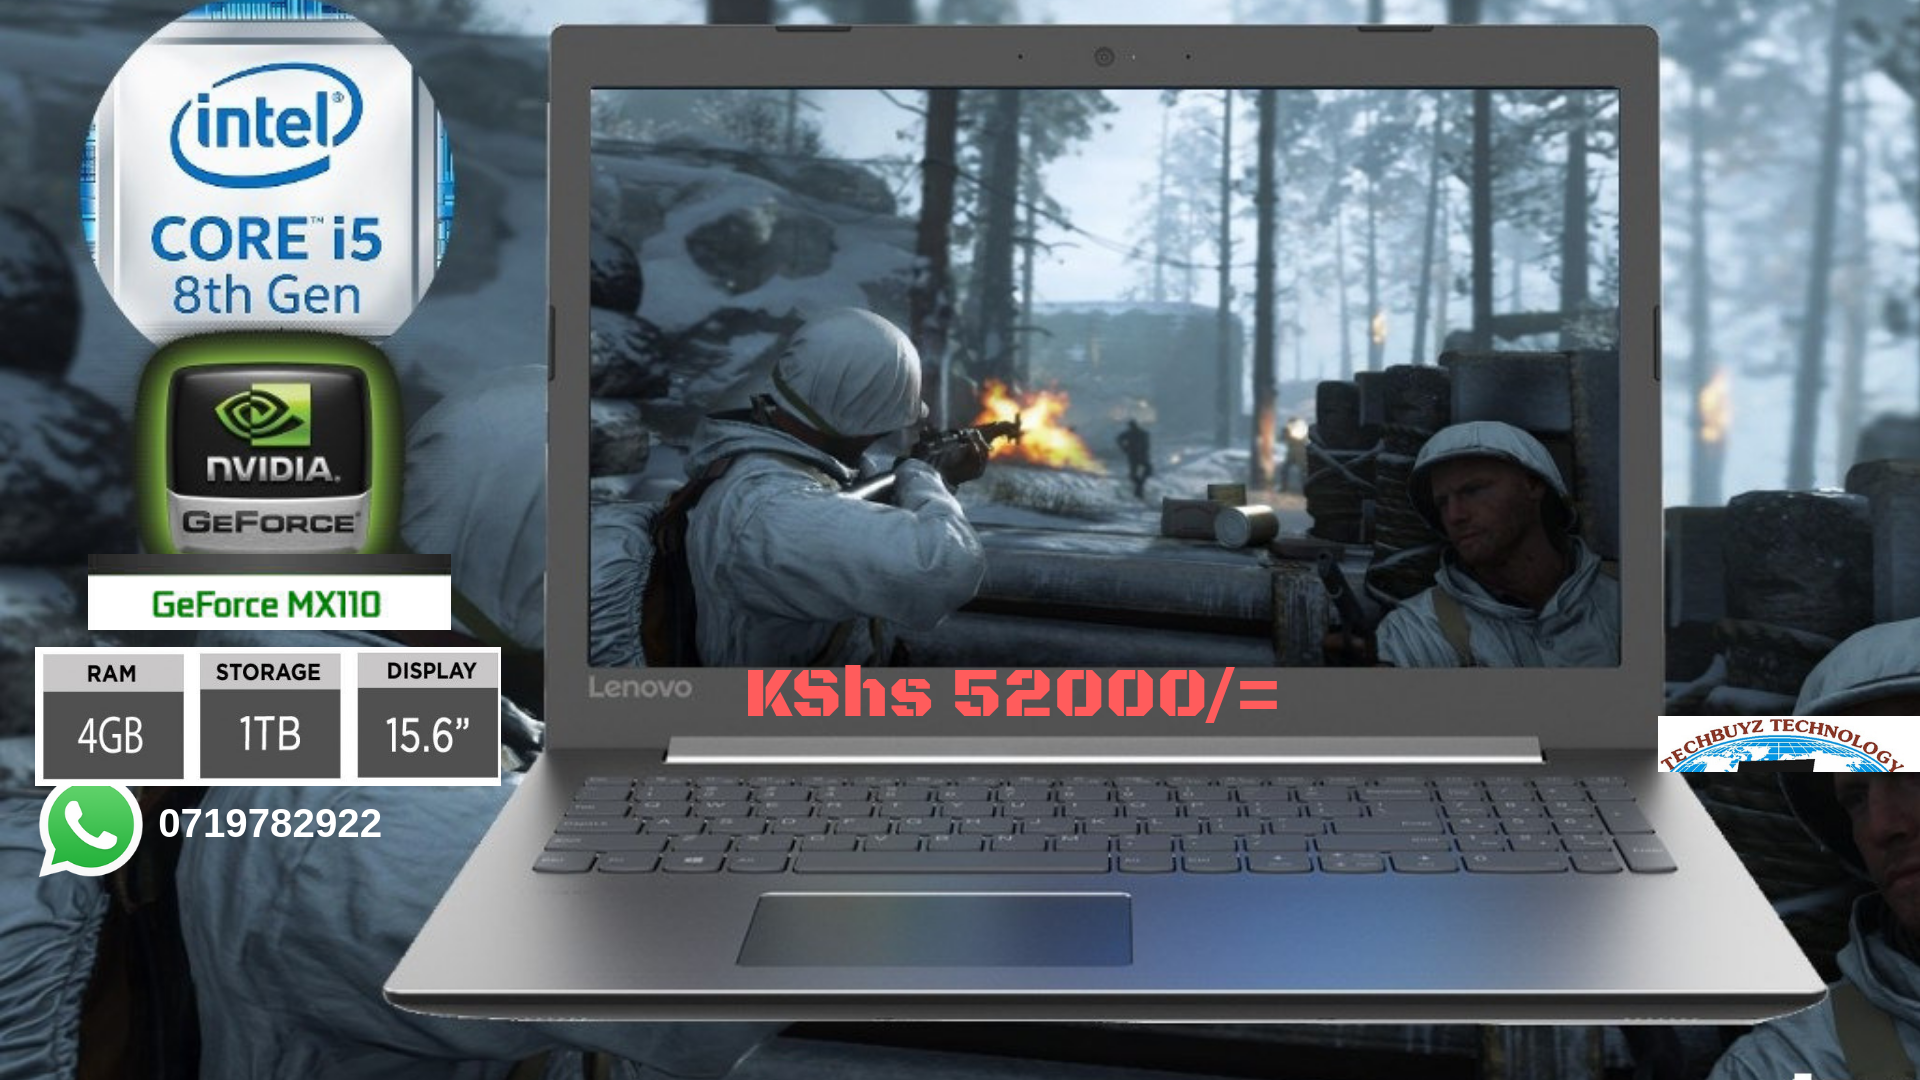 Nvidia geforce mx110